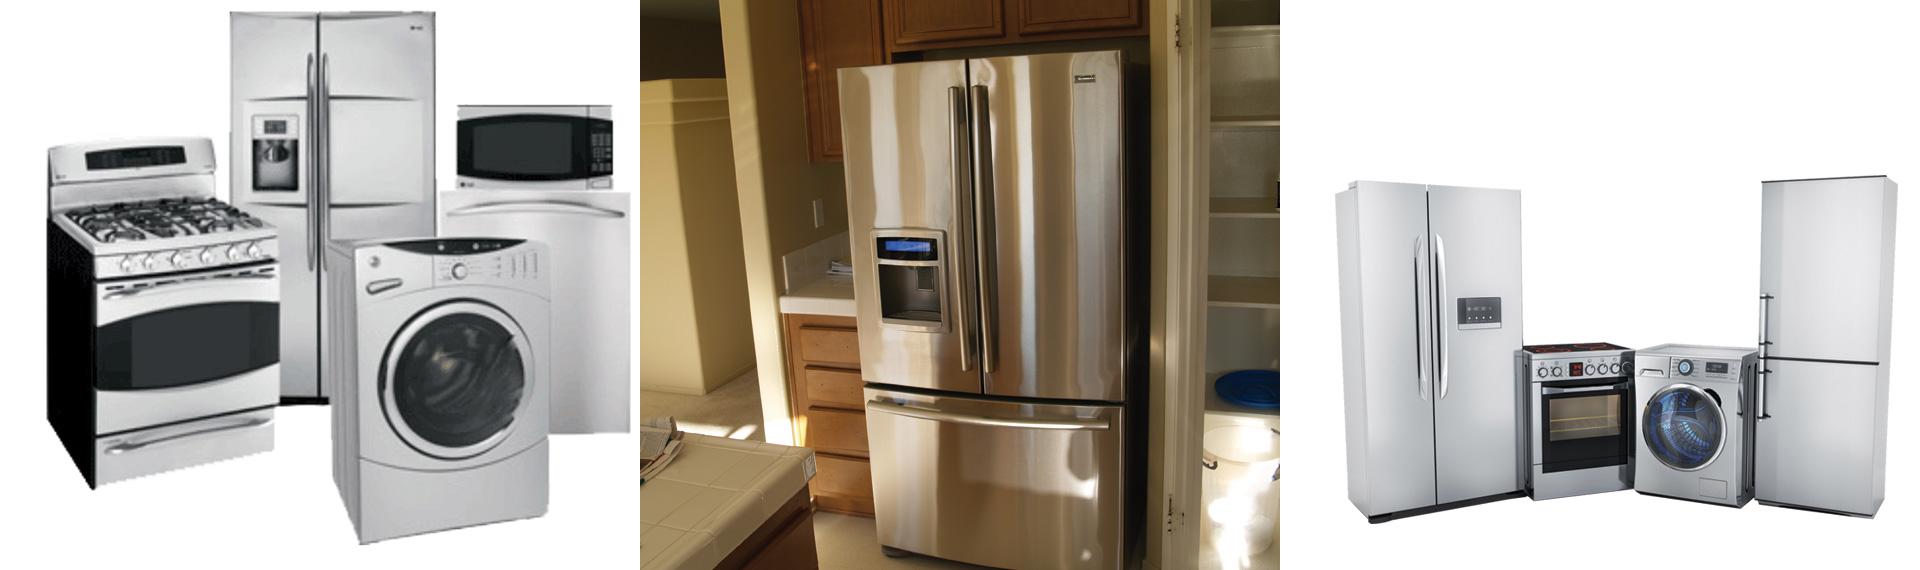 Appliance Care Upper Arlington OH